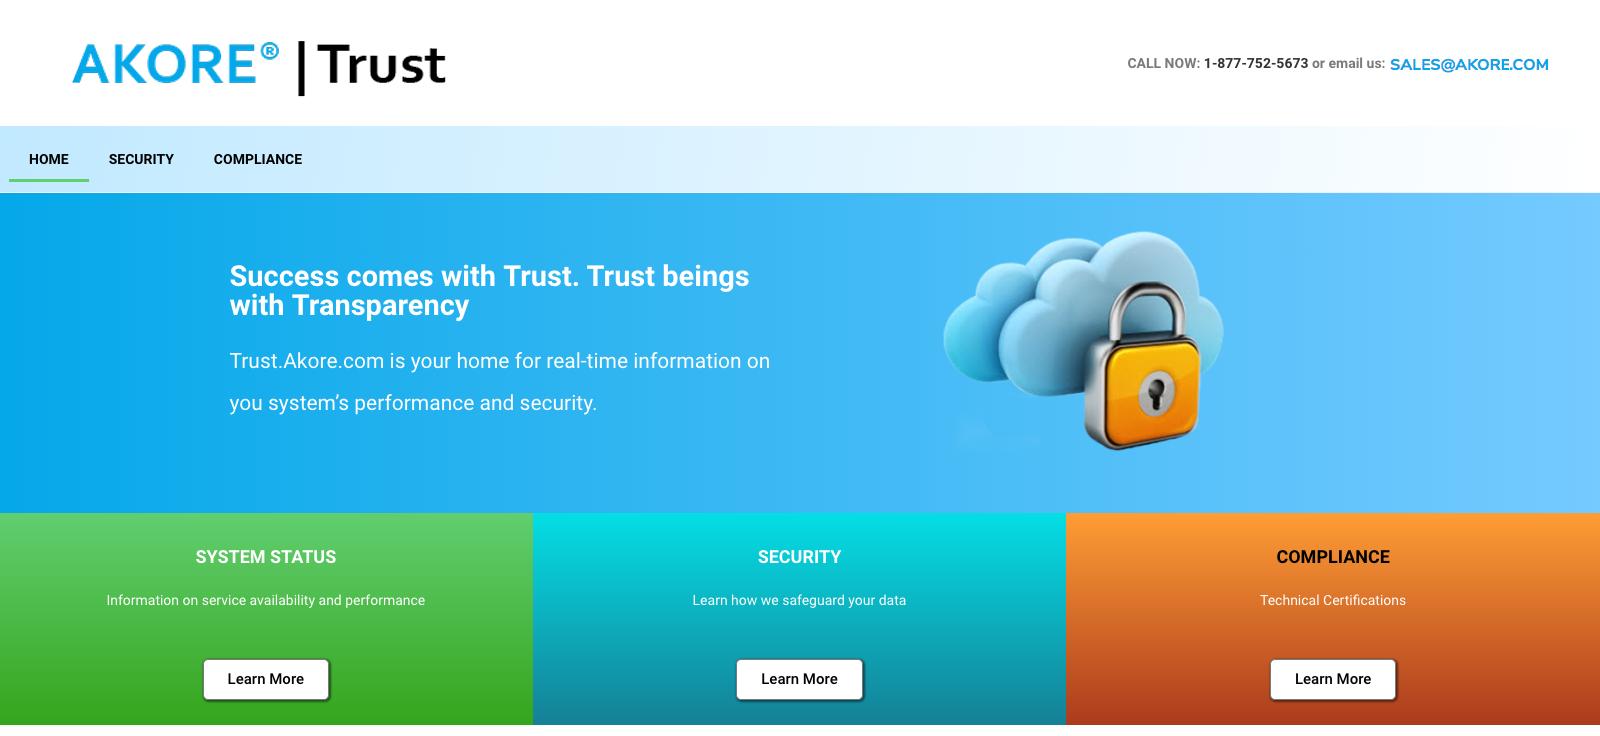 trust.akore.com